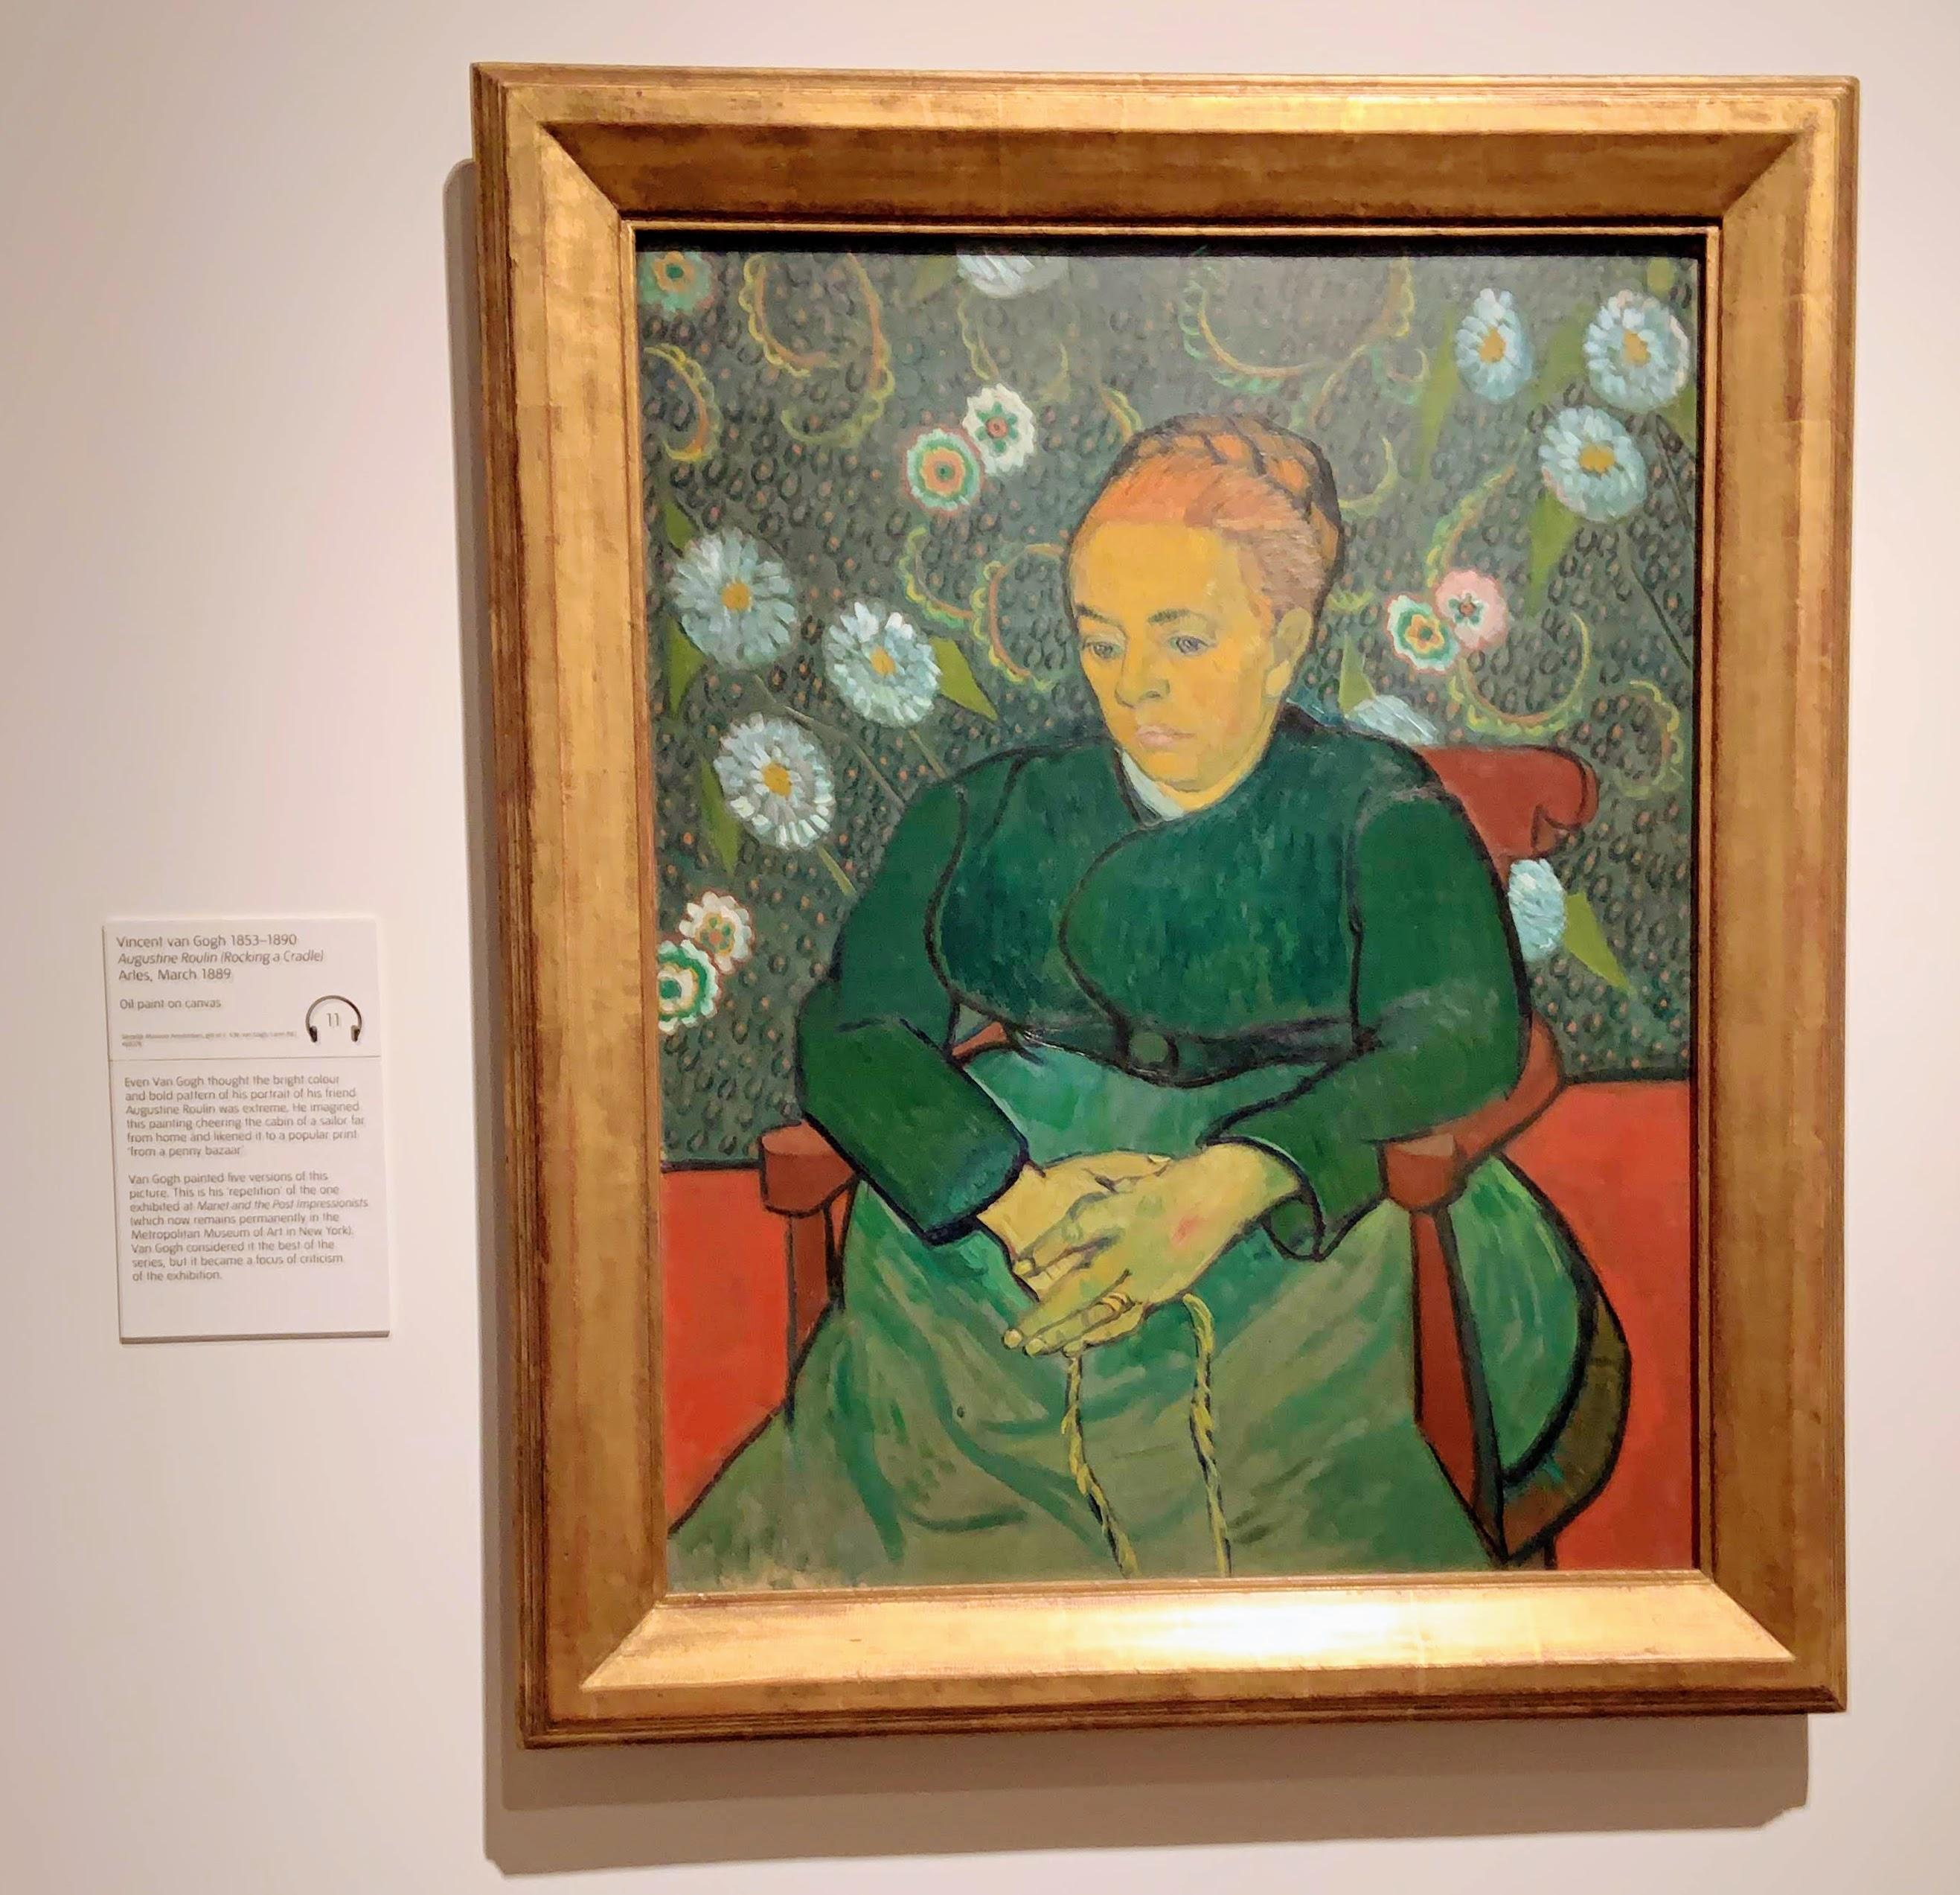 Vincent van Gogh - Augustine Roulin (Rocking a Cradle). Arles, March 1889